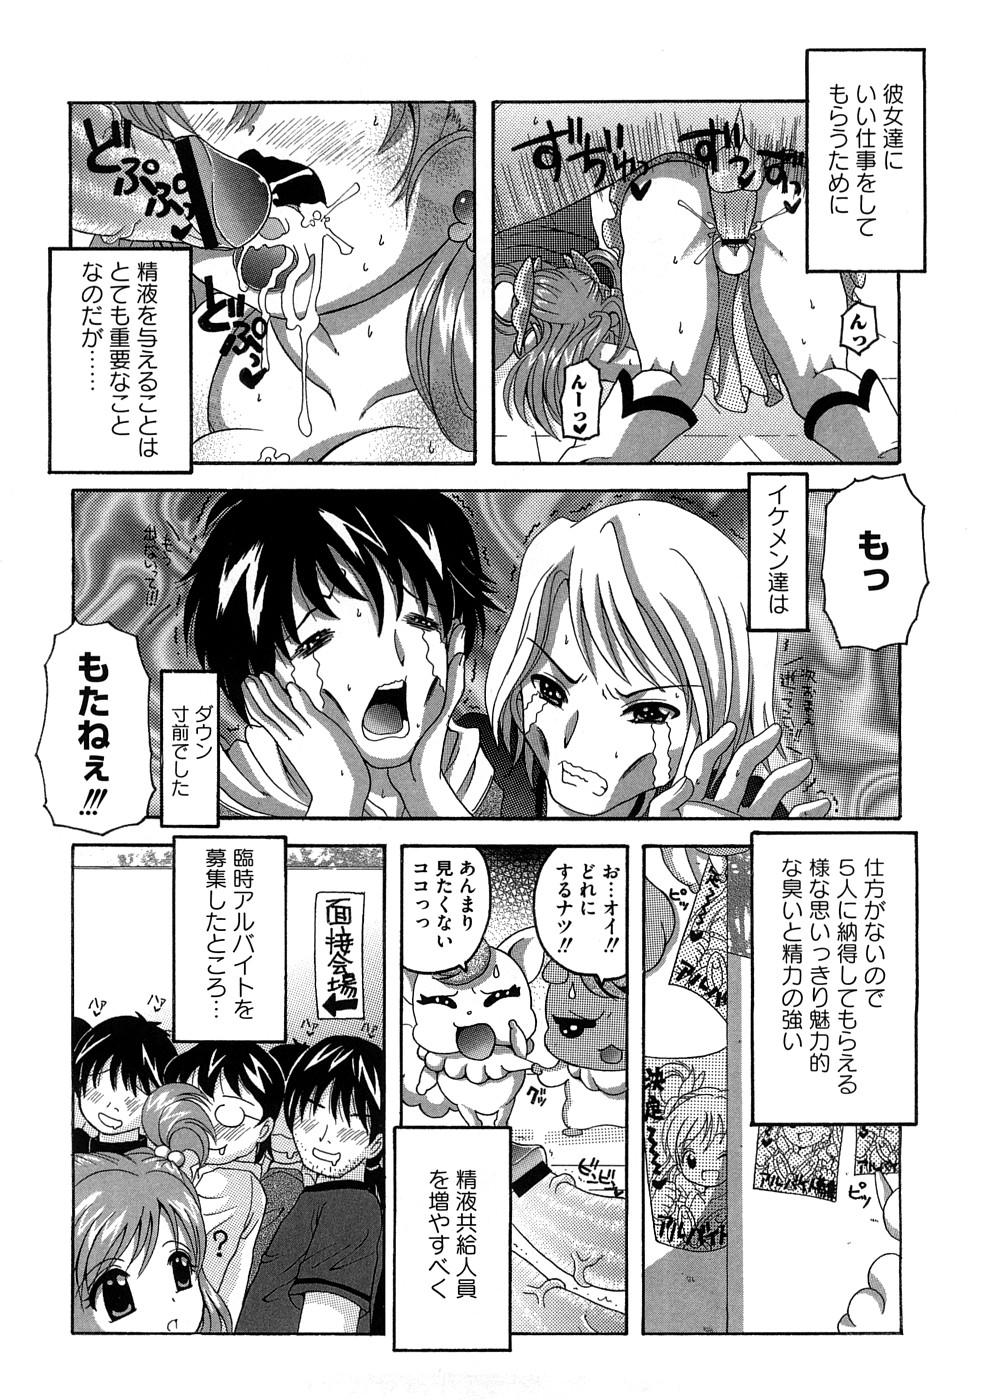 Cure Cure Ryoujoku Emaki Pre●ure EroParoAnthology 130